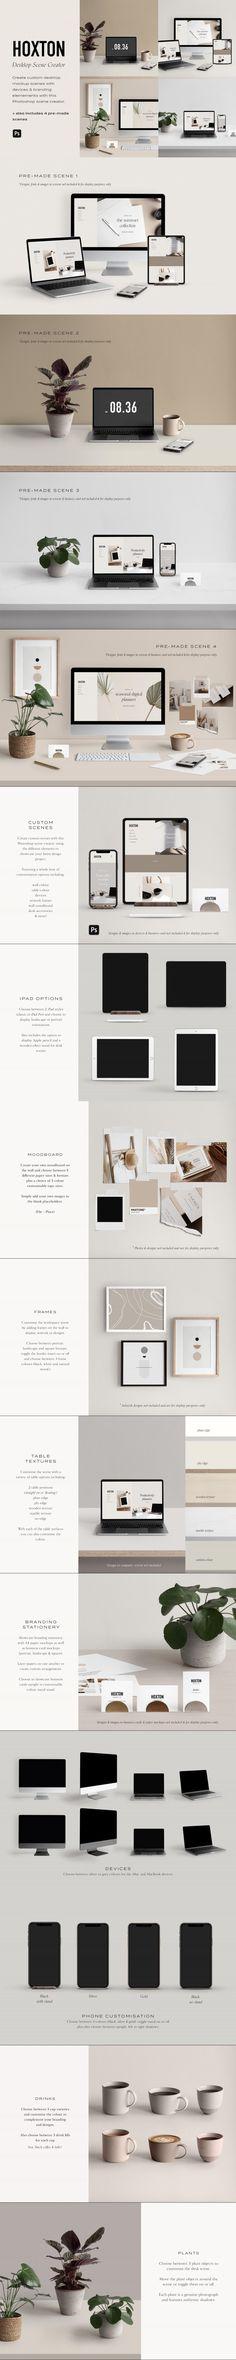 Desktop & Multi Device Scene Creator #folded #devices #wedding #apple #mockup #MockupTemplates #branding #stone #stationerymockup #TemplateDesign #valentinesday #responsivemockup #sticky #instagram #weddingstyledstock #naturaltones #MockupTemplates #placecard #computer